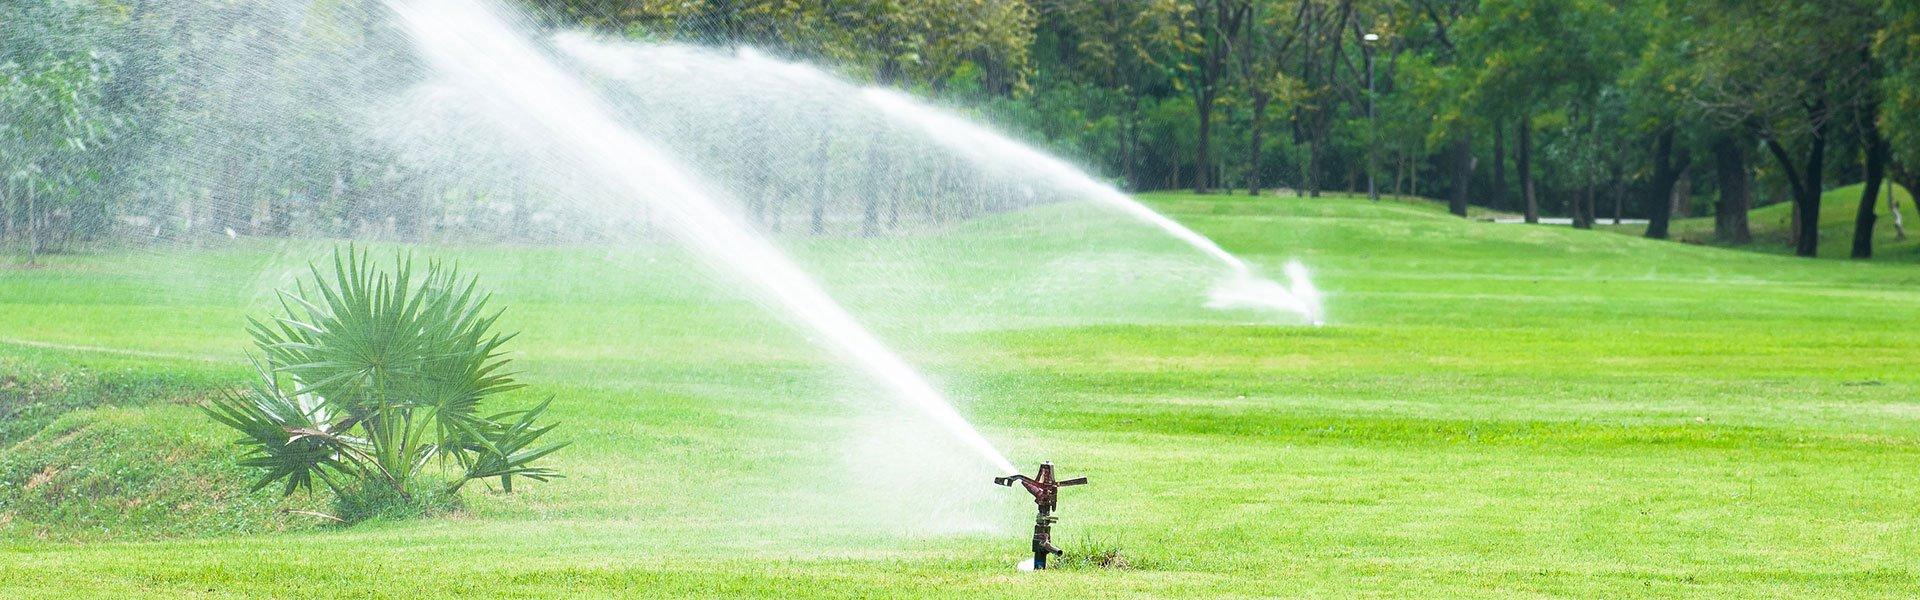 Irrigation System